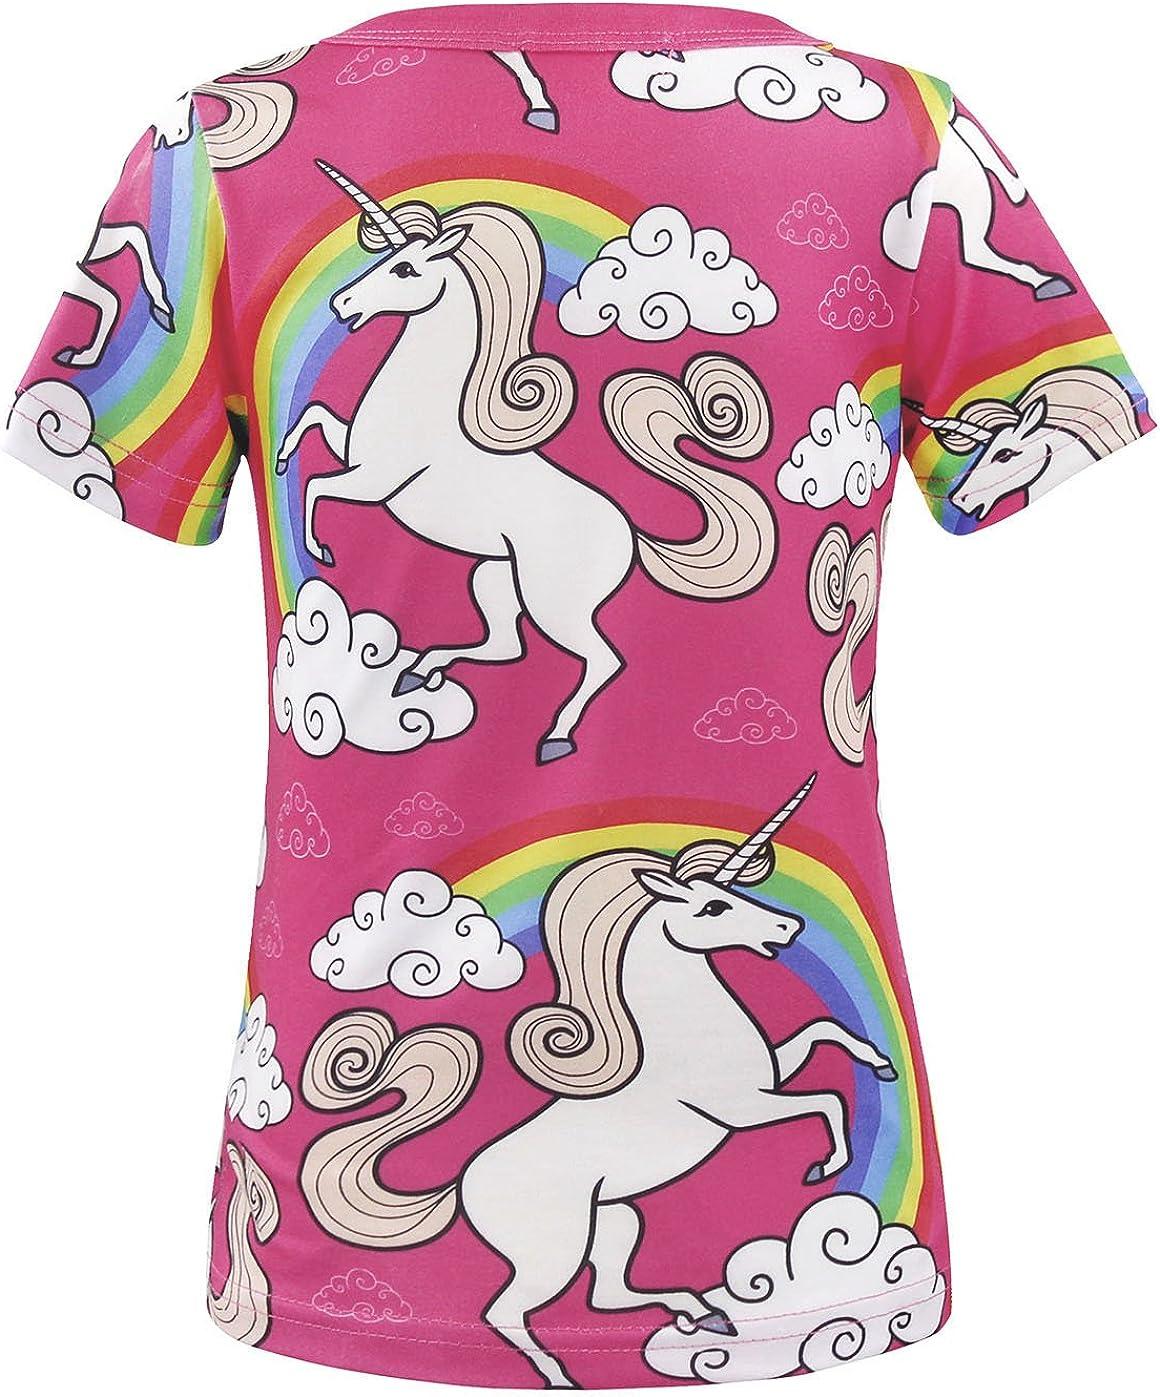 AmzBarley Unicornio Pijamas Ni/ños Ni/ñas Ropa de Dormir Halloween Cosplay